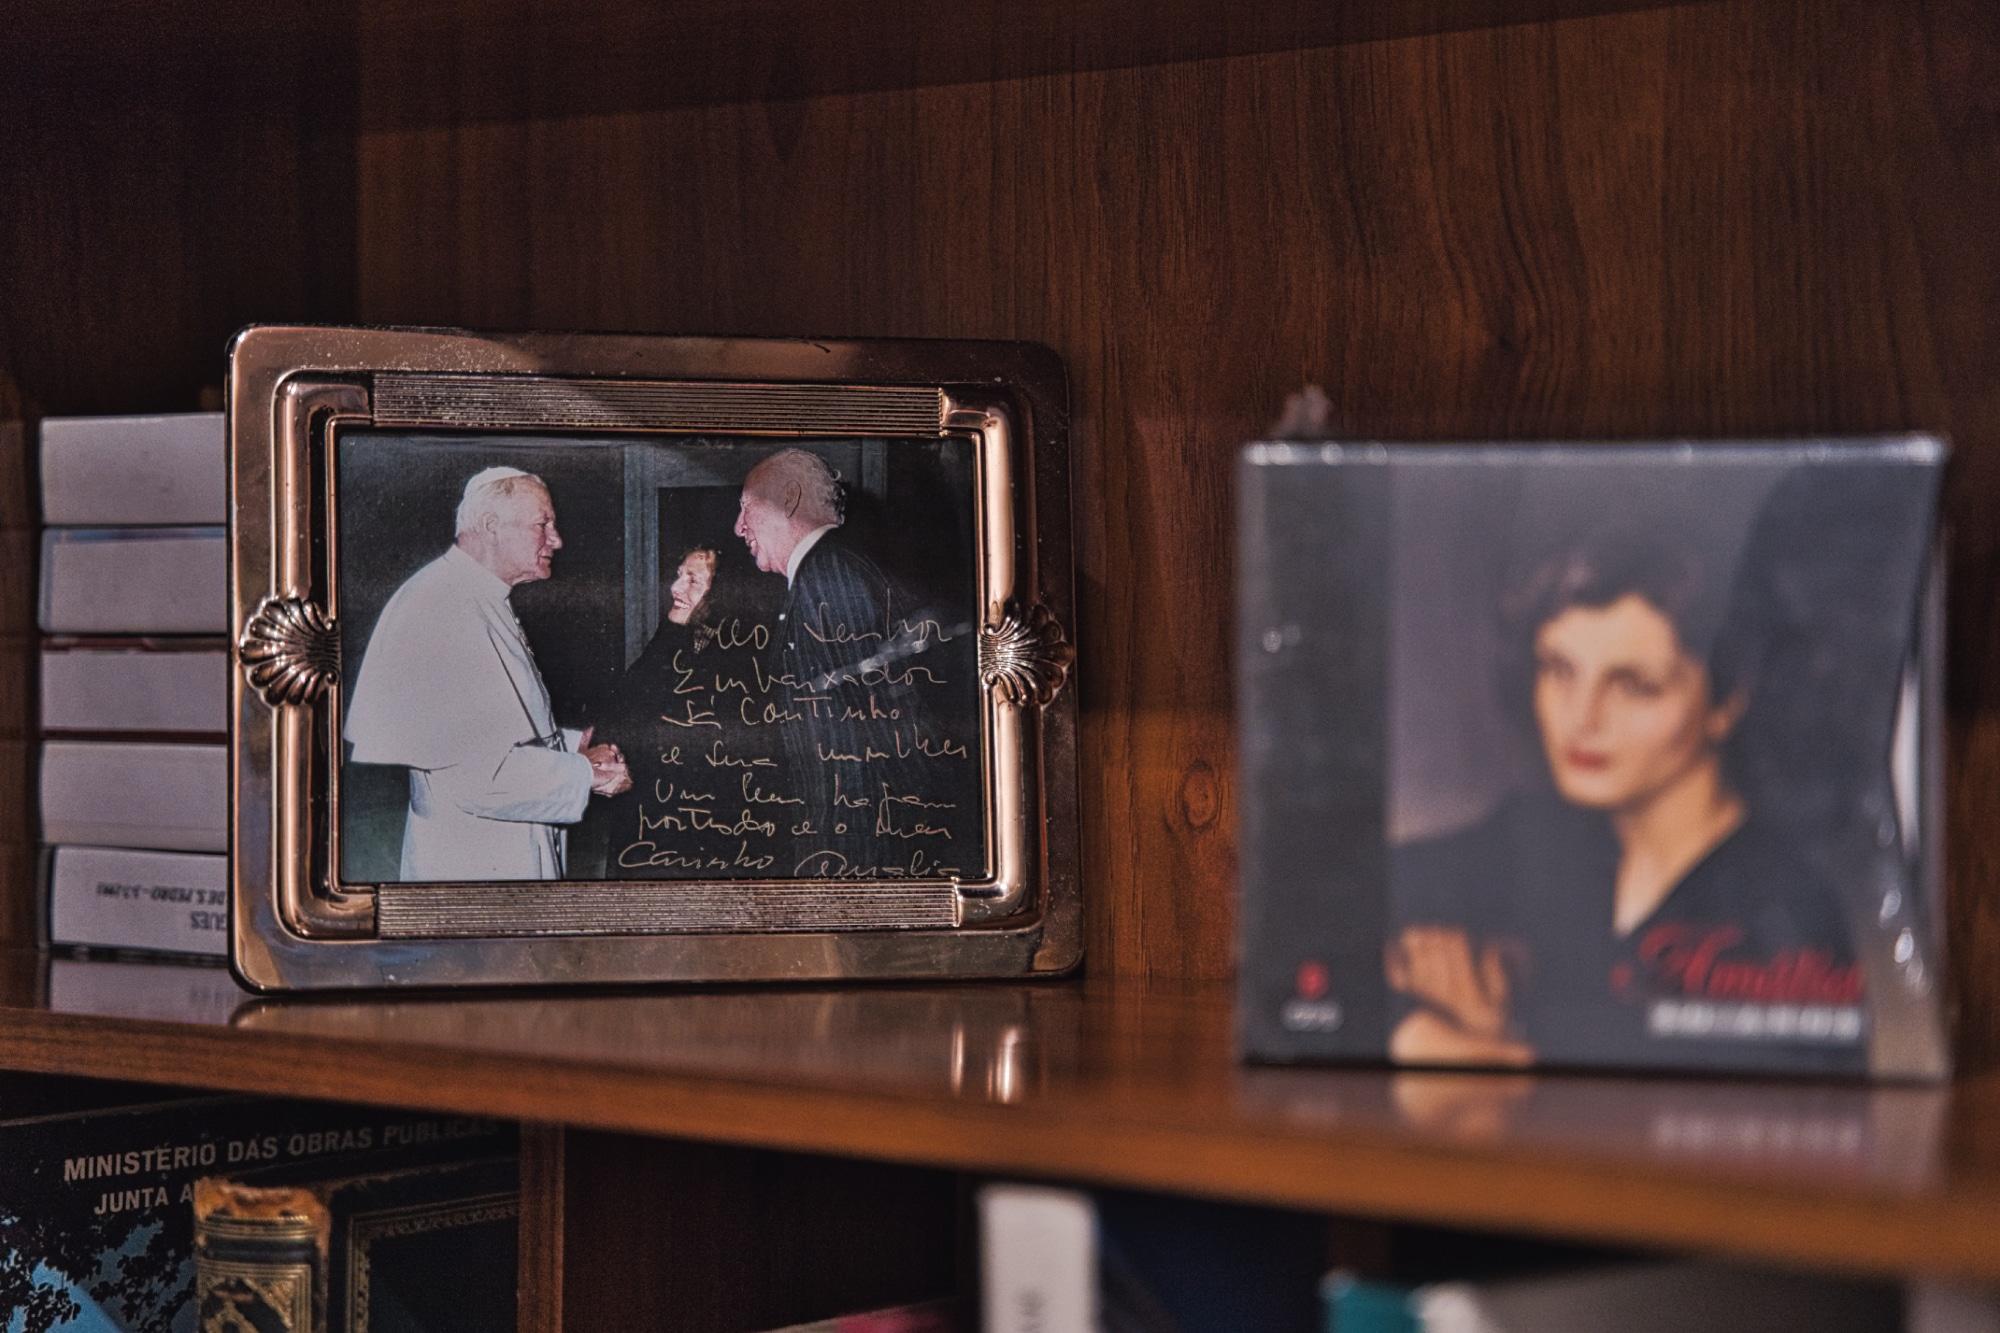 E aqui, na companhia do saudoso Papa João Paulo II.